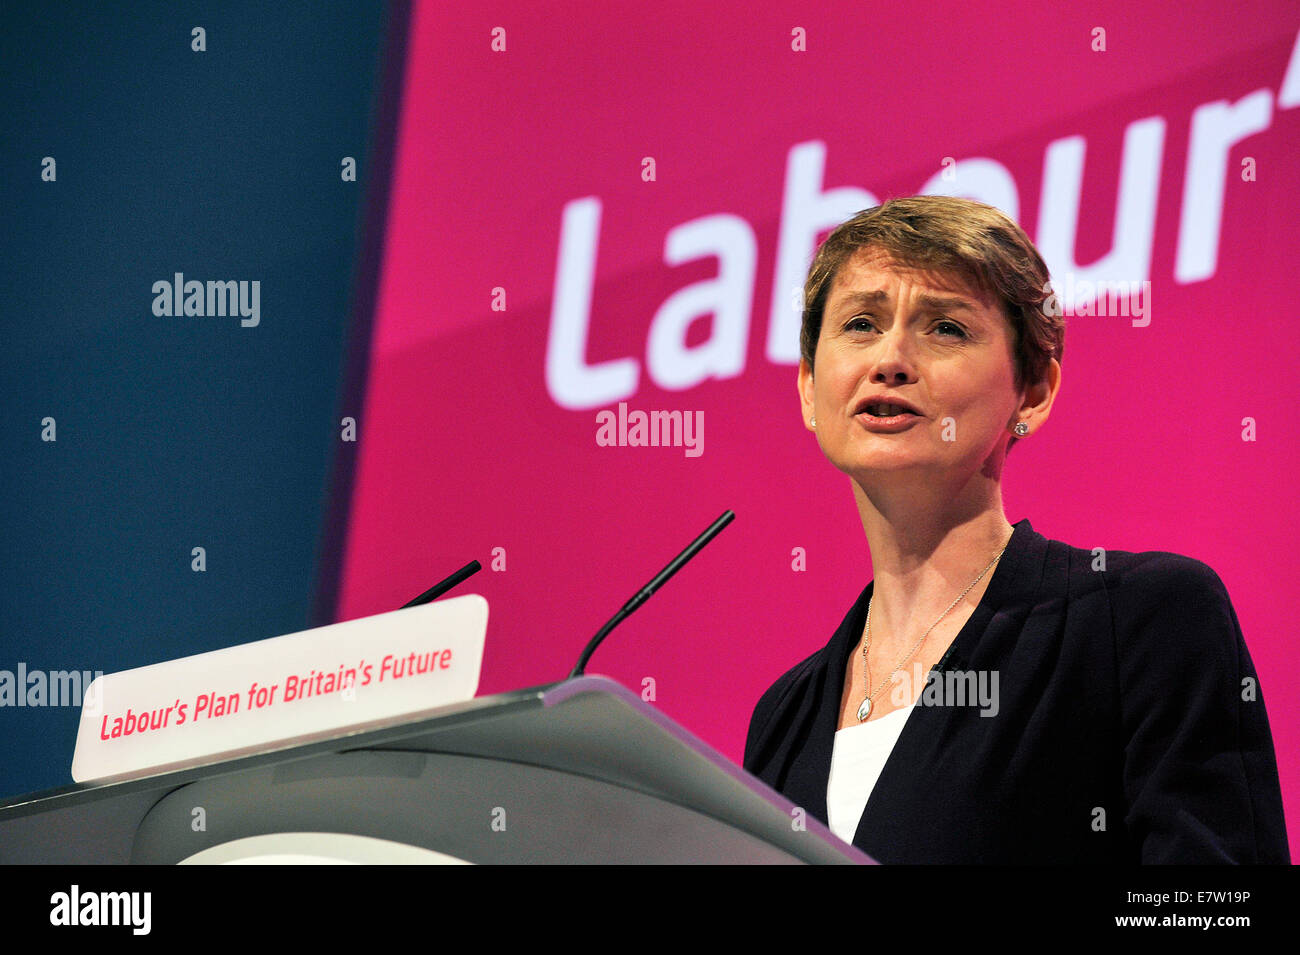 Asombroso Partido Cequi Reino Unido Motivo - Ideas de Estilos de ...